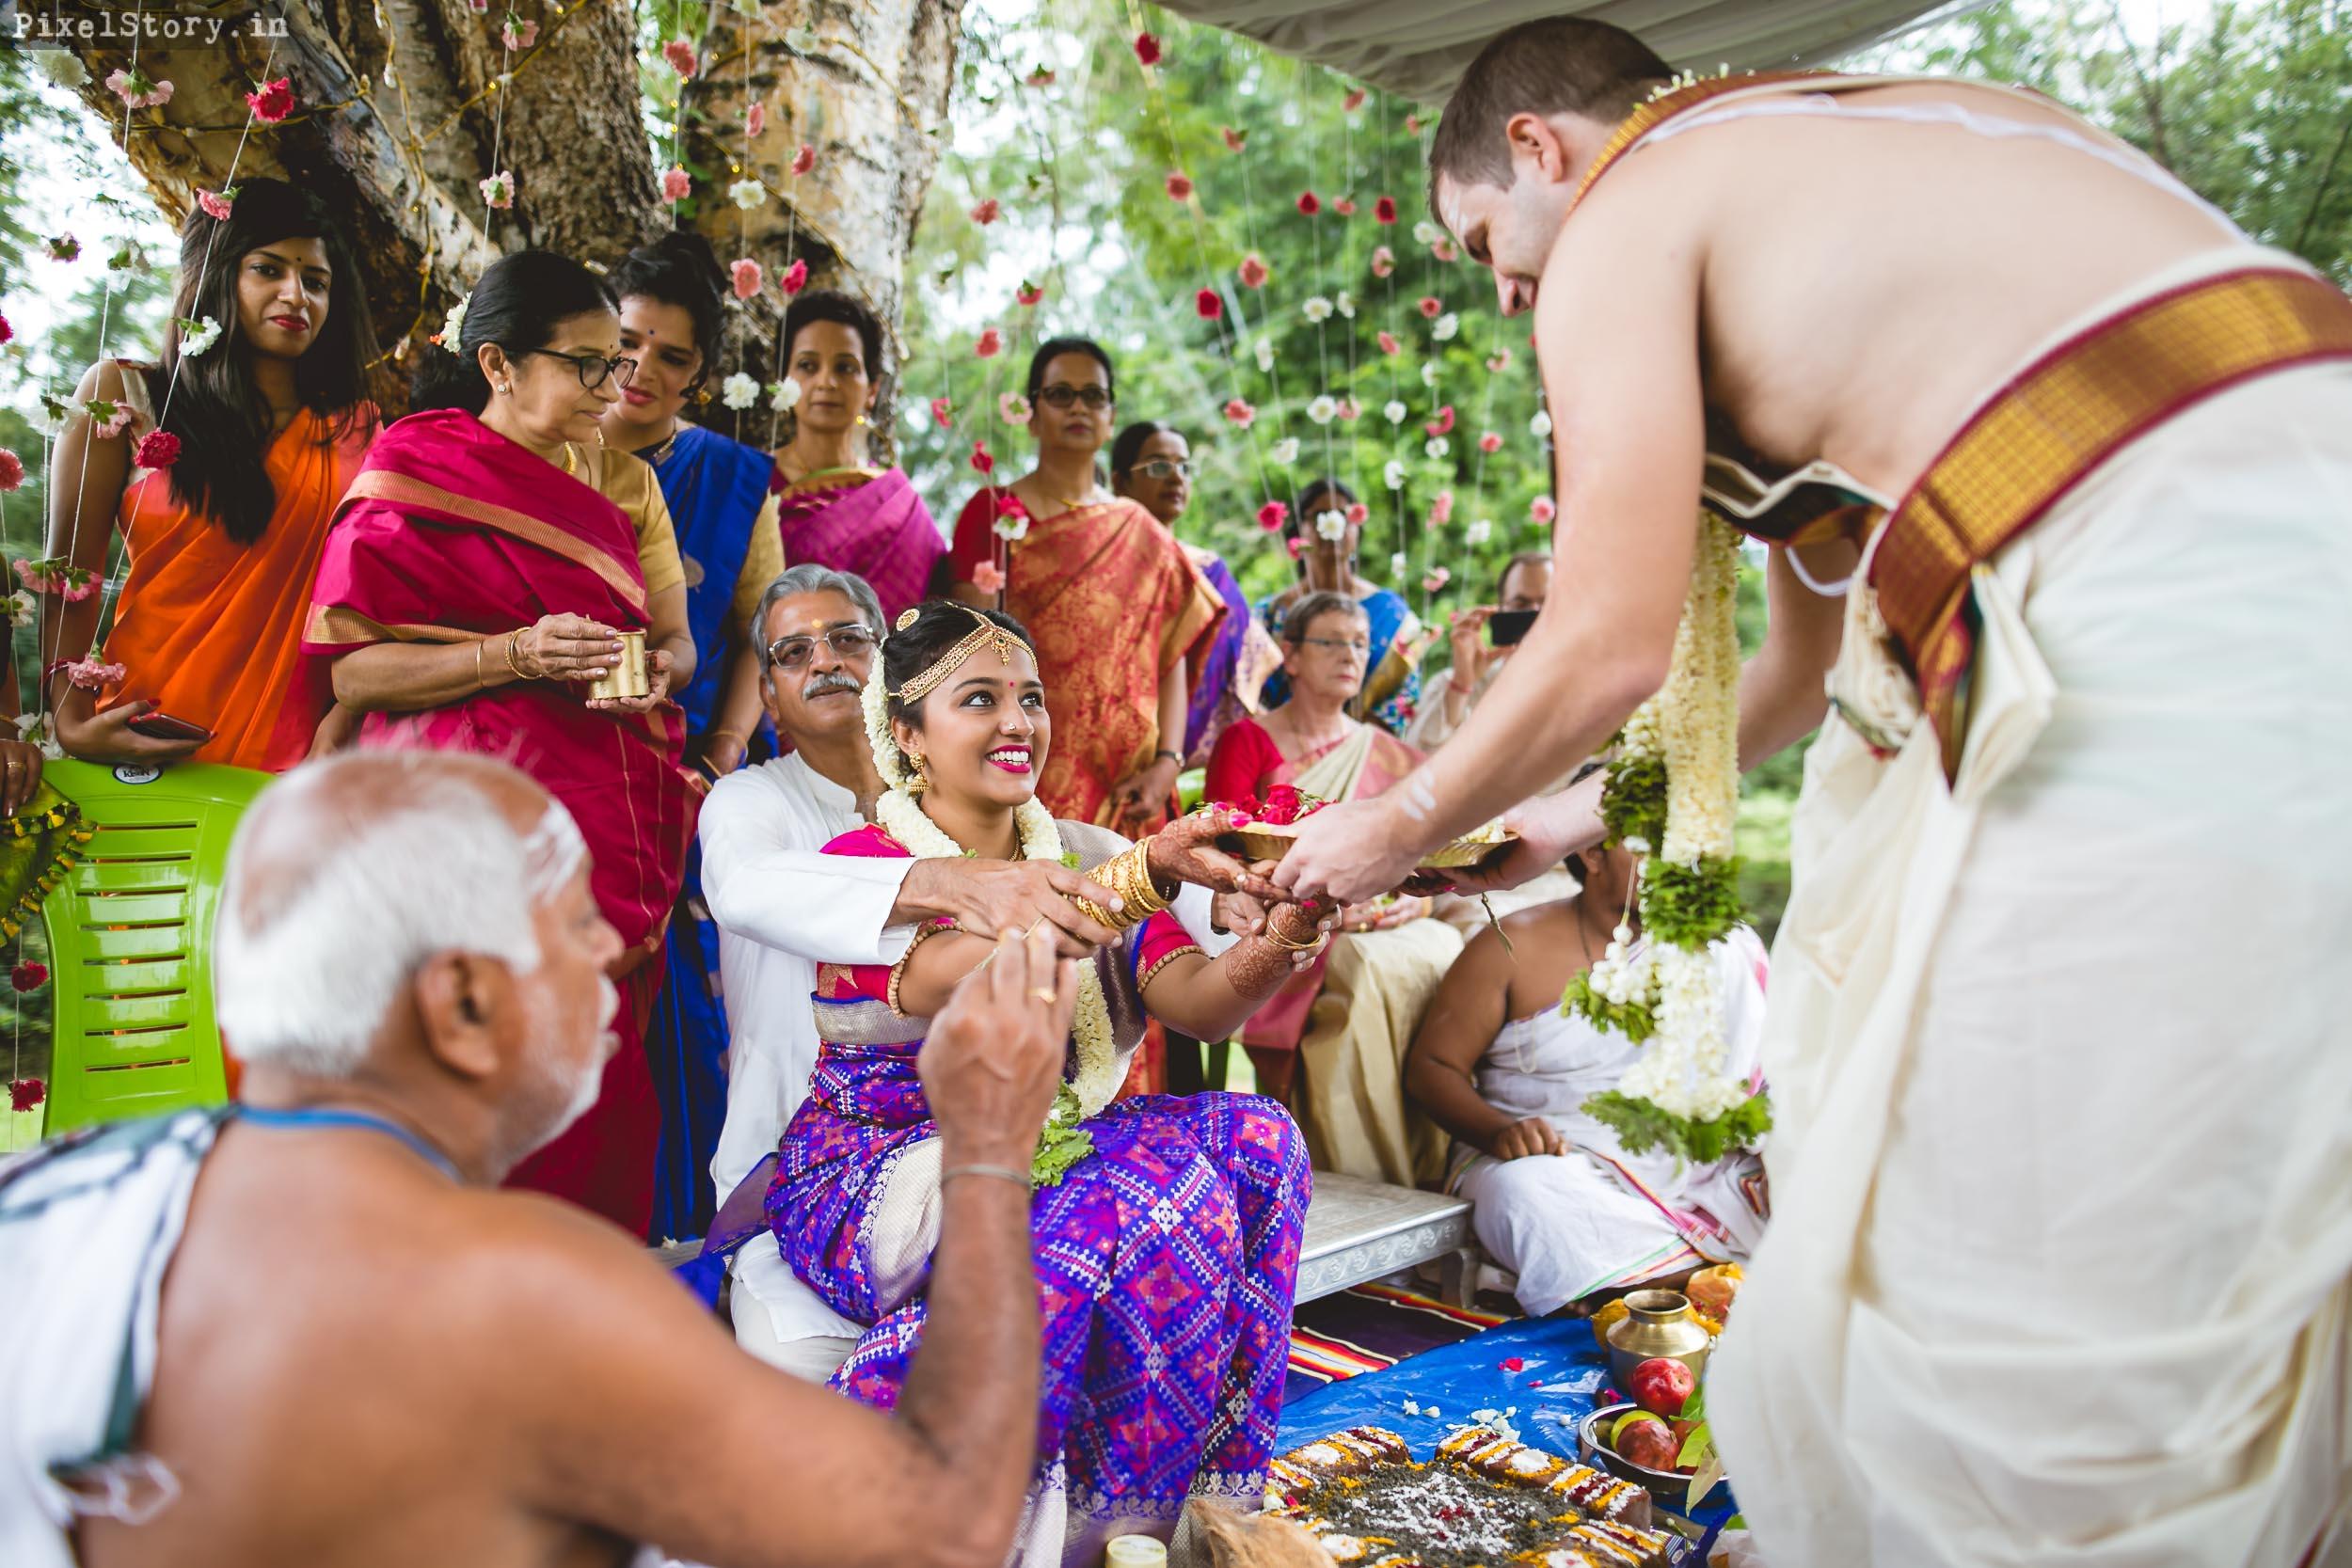 PixelStory-Jungle-Wedding-Photographer-Masinagudi-Indo-French054.jpg